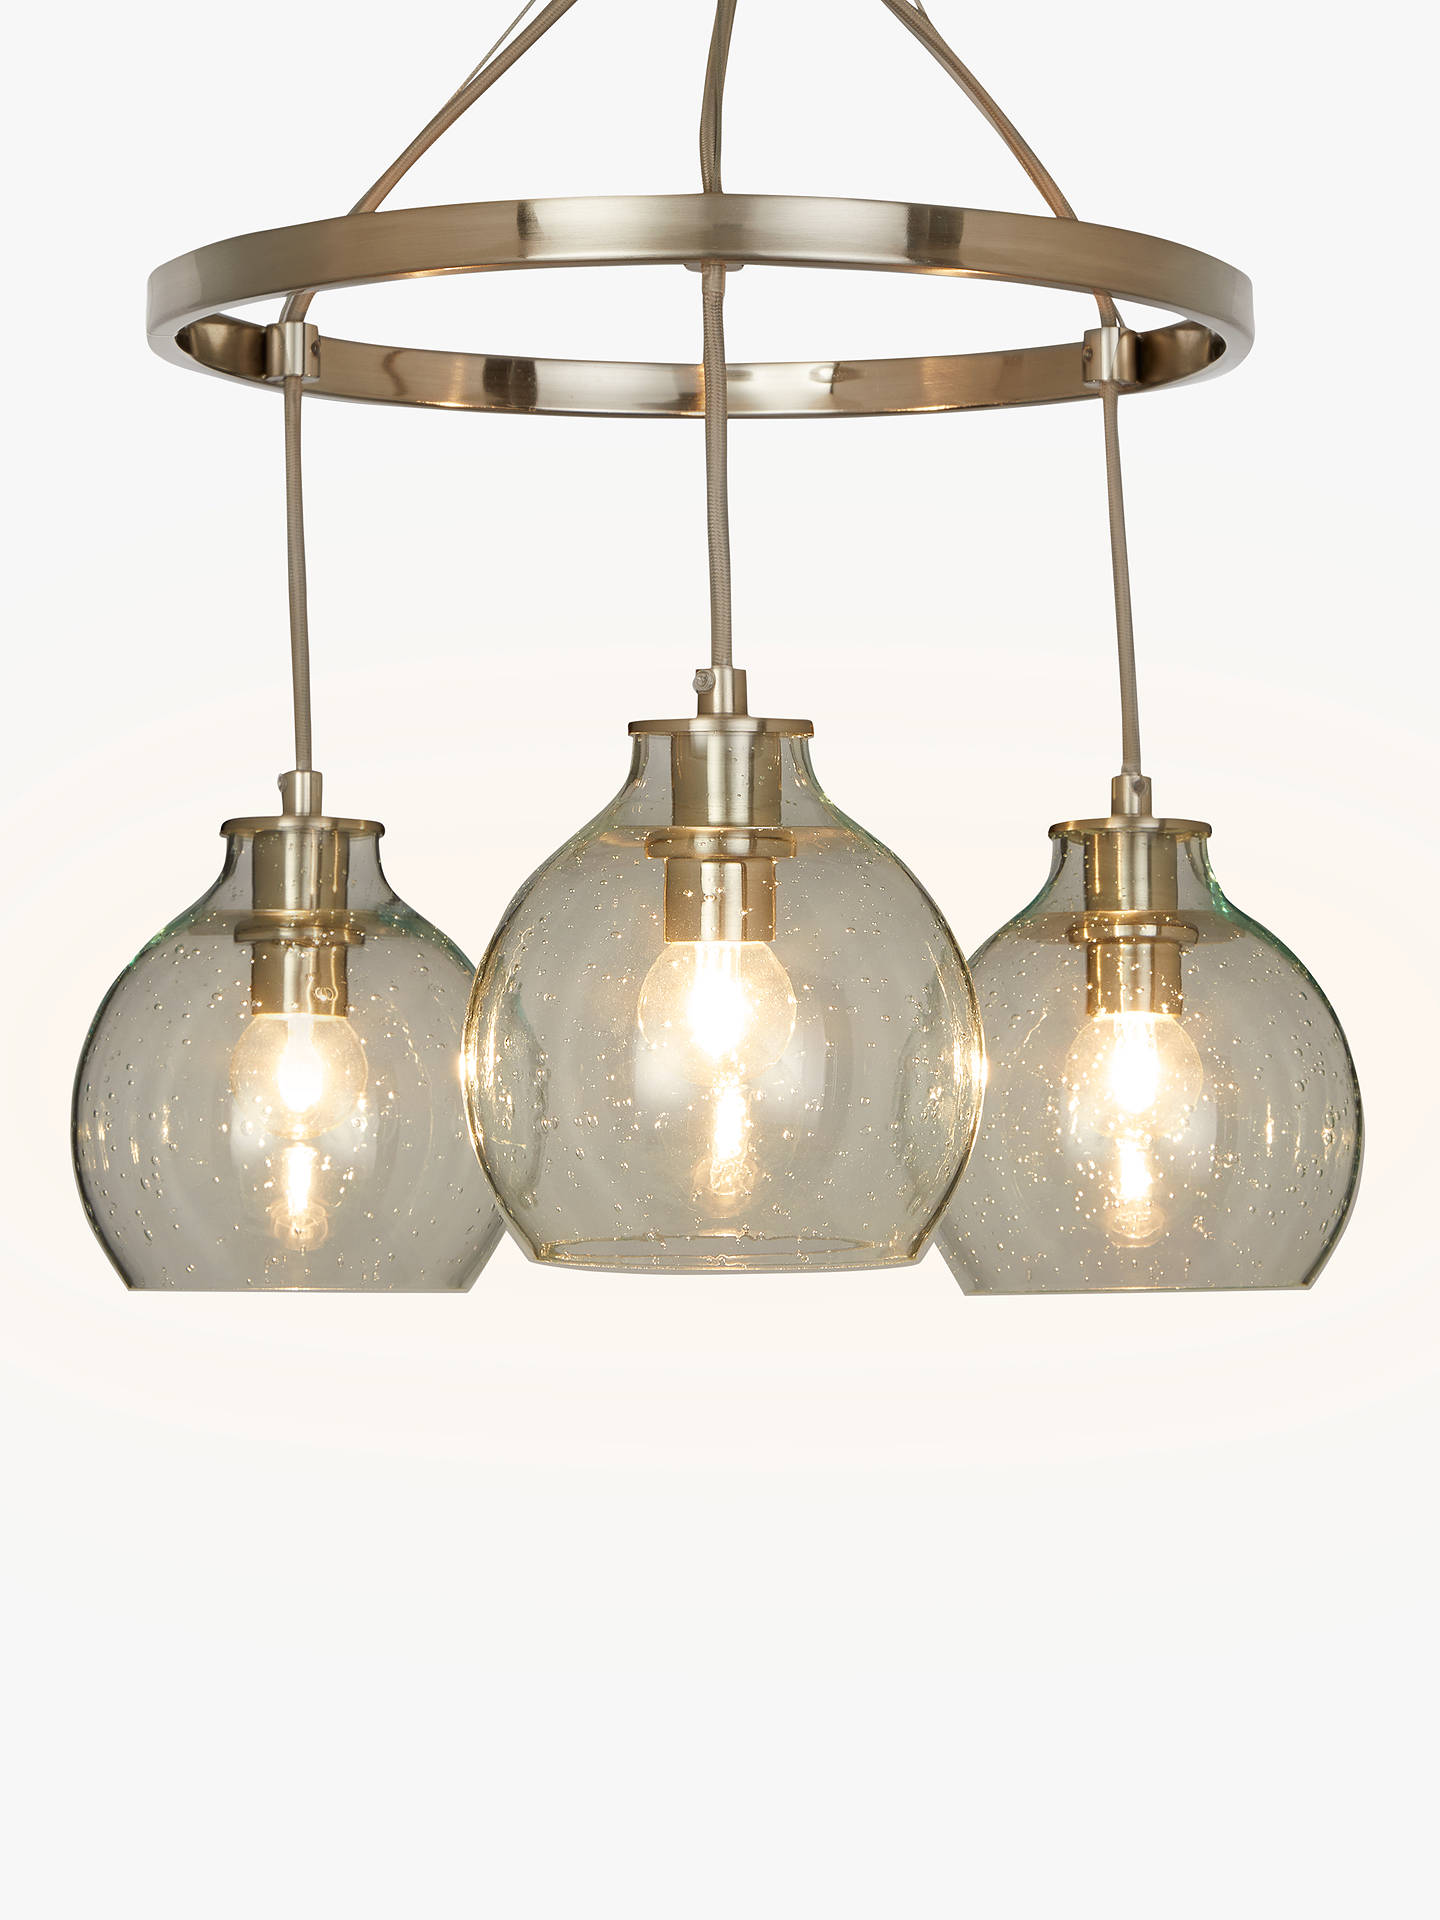 Buy Croft Collection Selsey Semi Flush 3 Pendant Ceiling Light Blue Chrome Online